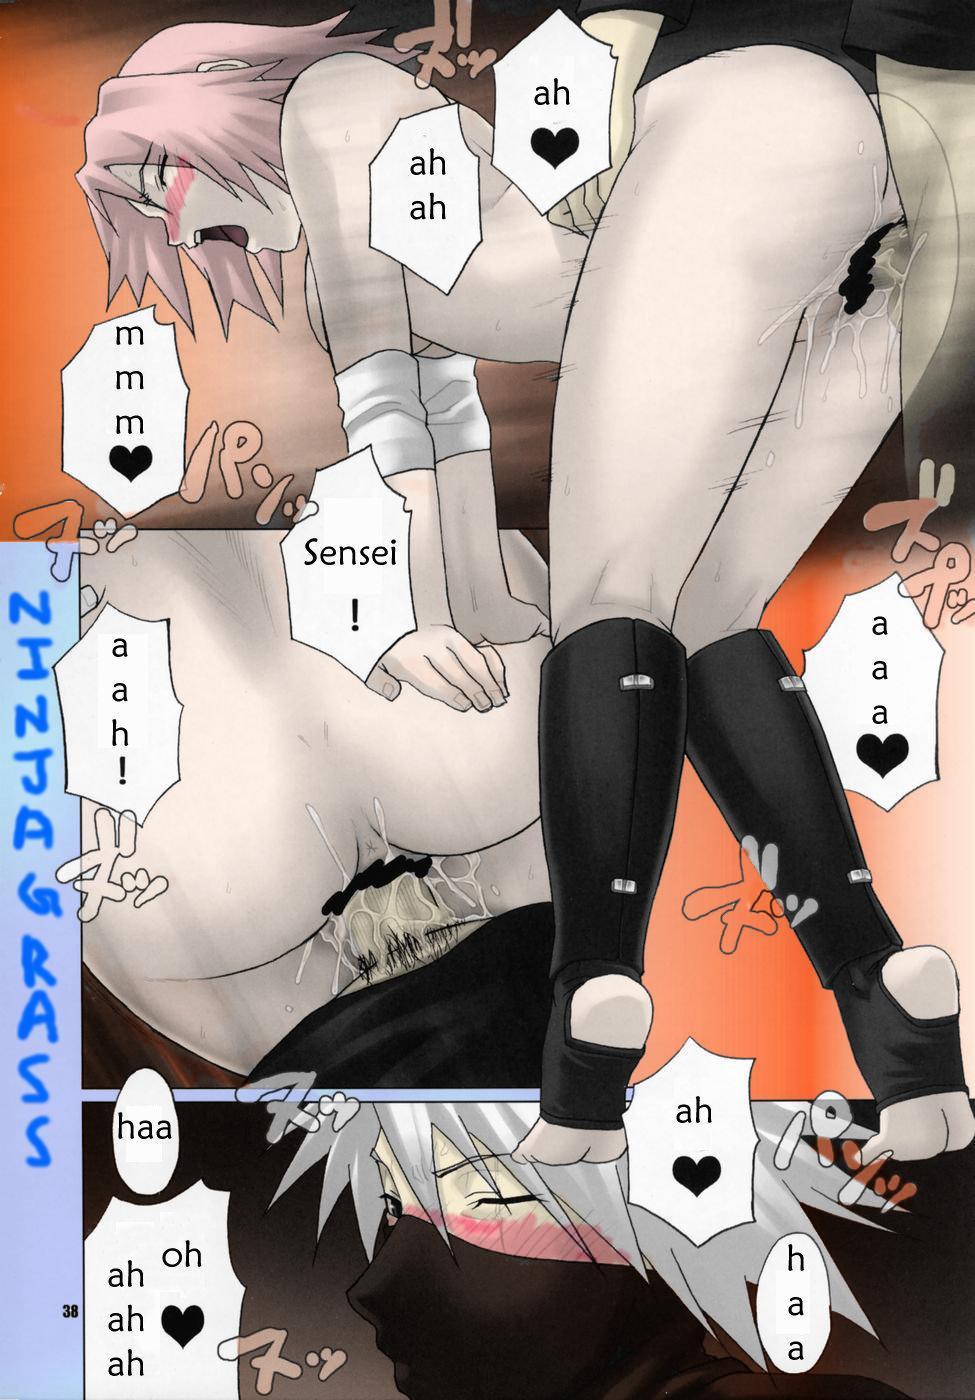 Himitsu - The Secret 23